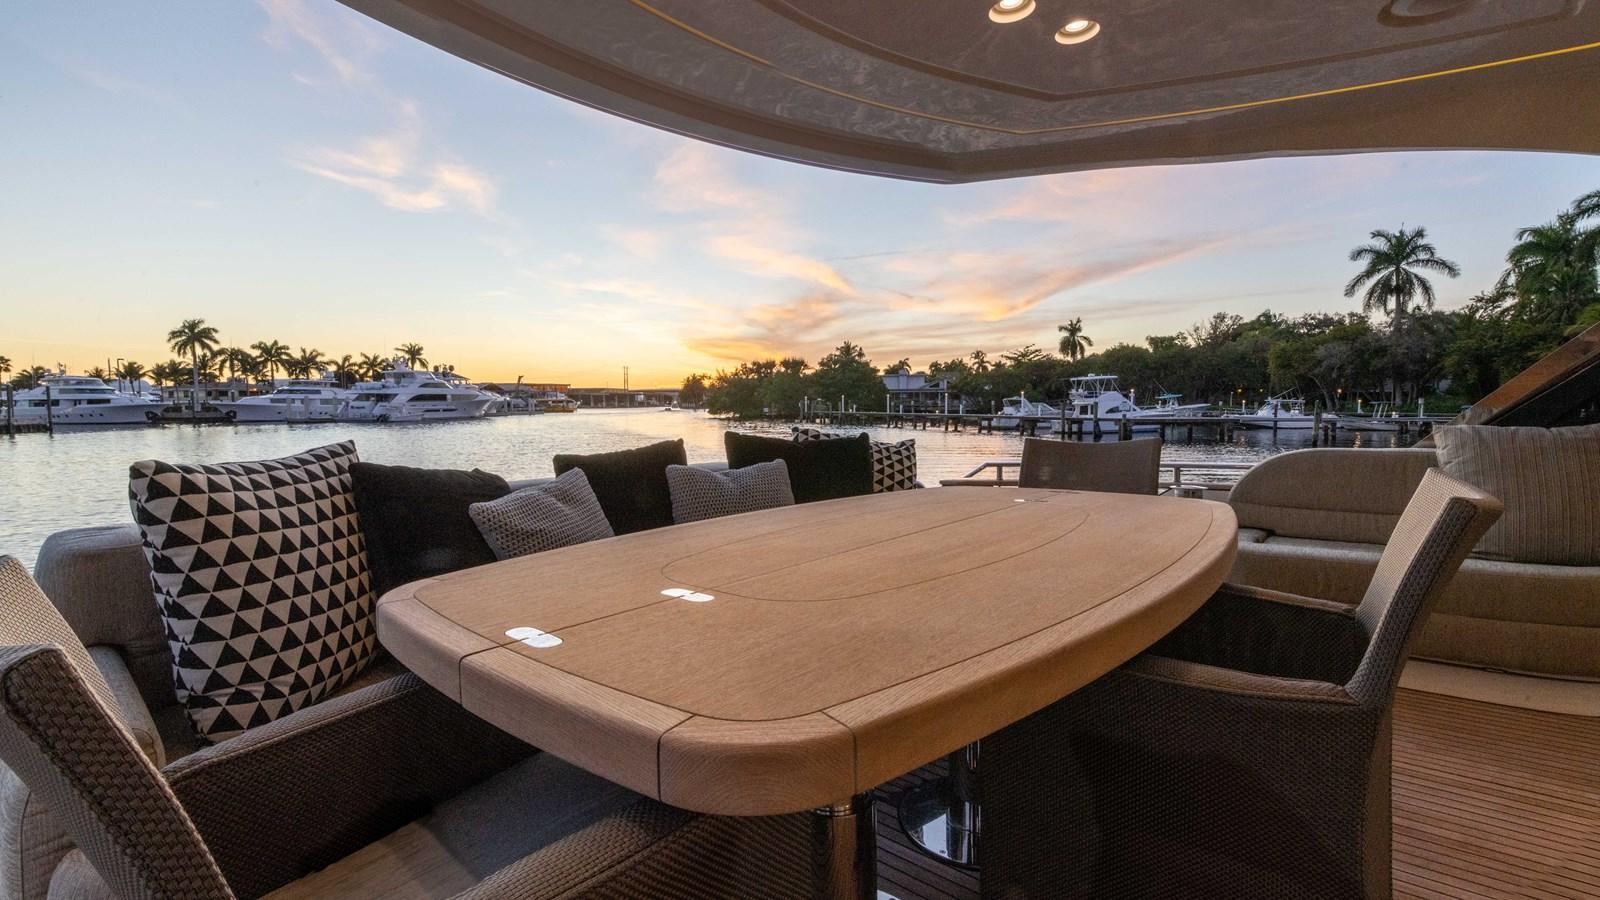 76 Monte Carlo (109 of 127) 2014 MONTE CARLO YACHTS Motoryacht Motor Yacht 2825067